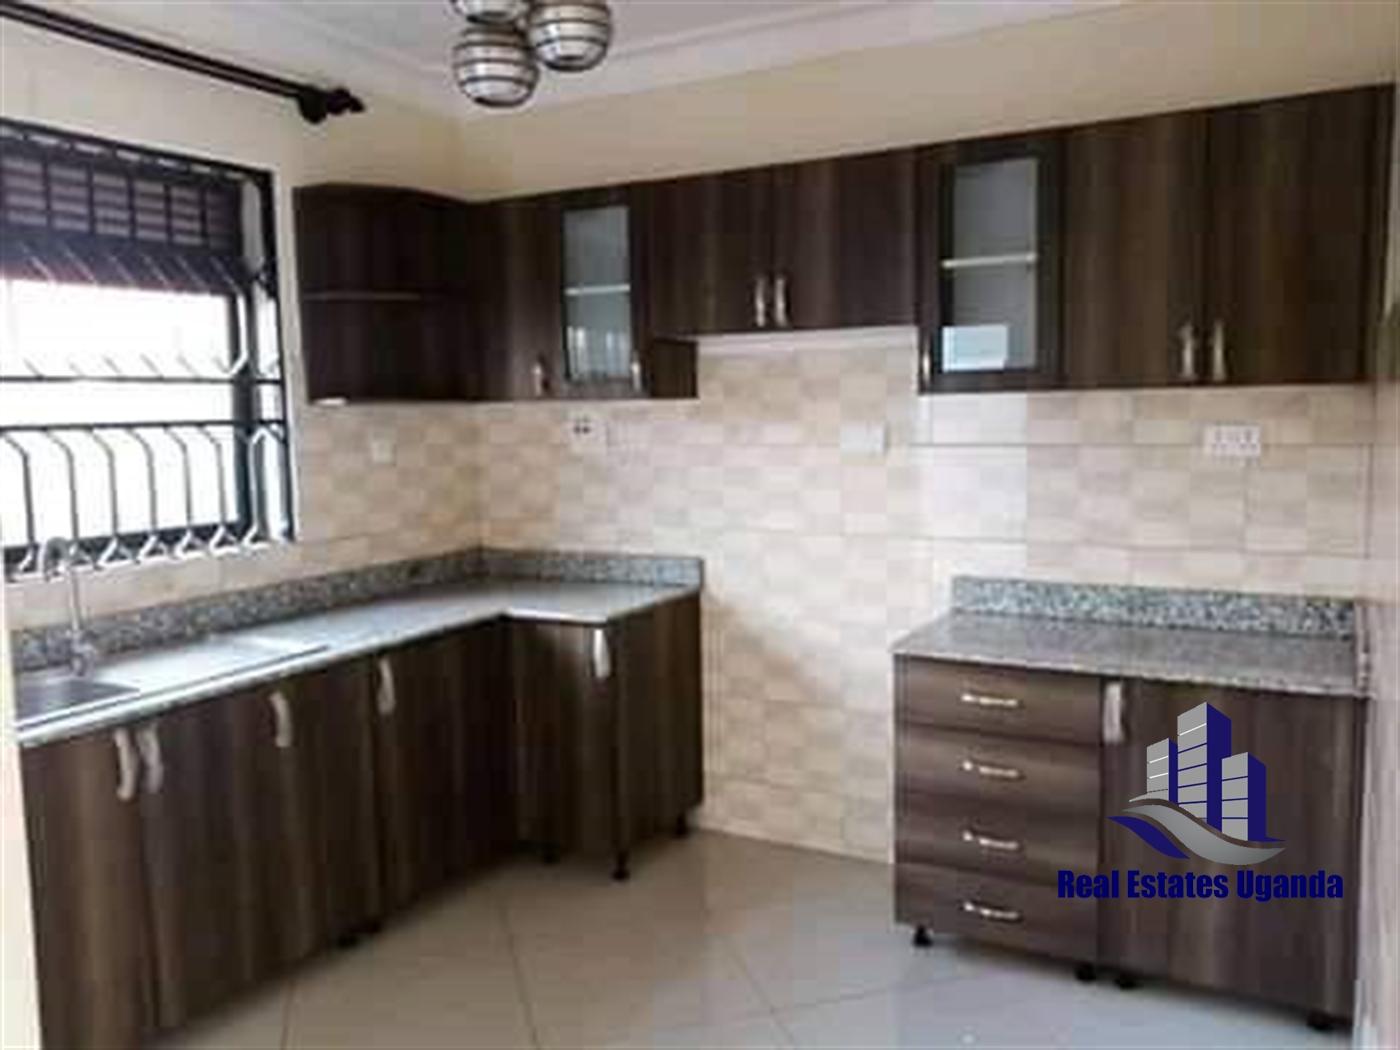 Rental units for rent in Najjera Kampala